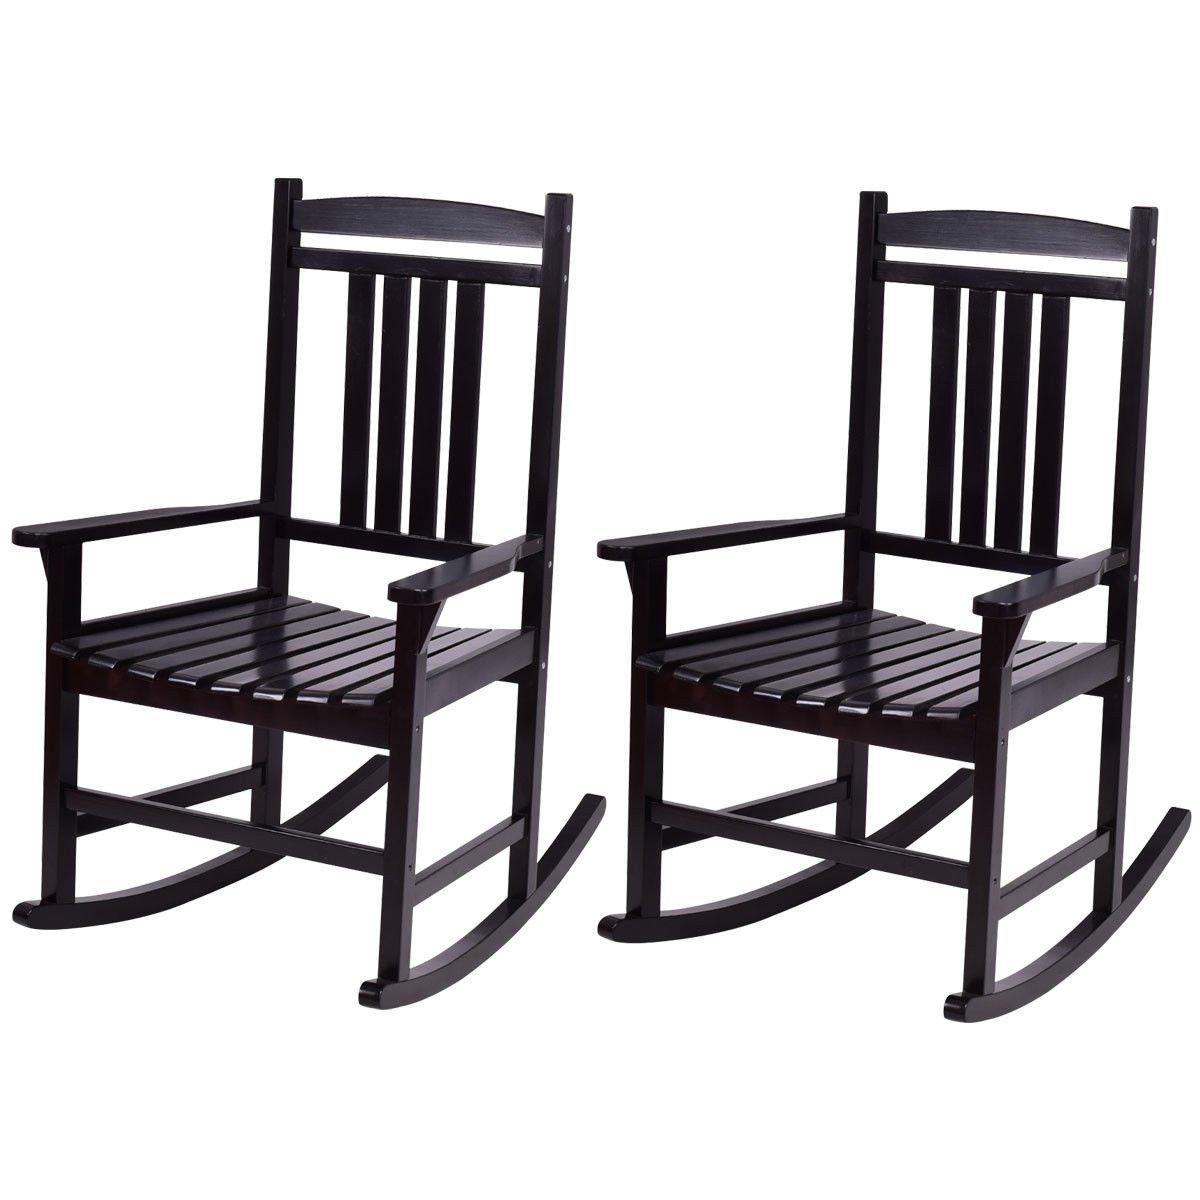 Giantex Set of 2 Wood Rocking Chair Outdoor Indoor Patio Porch Rocker for Porch, Patio, Living Room, Black